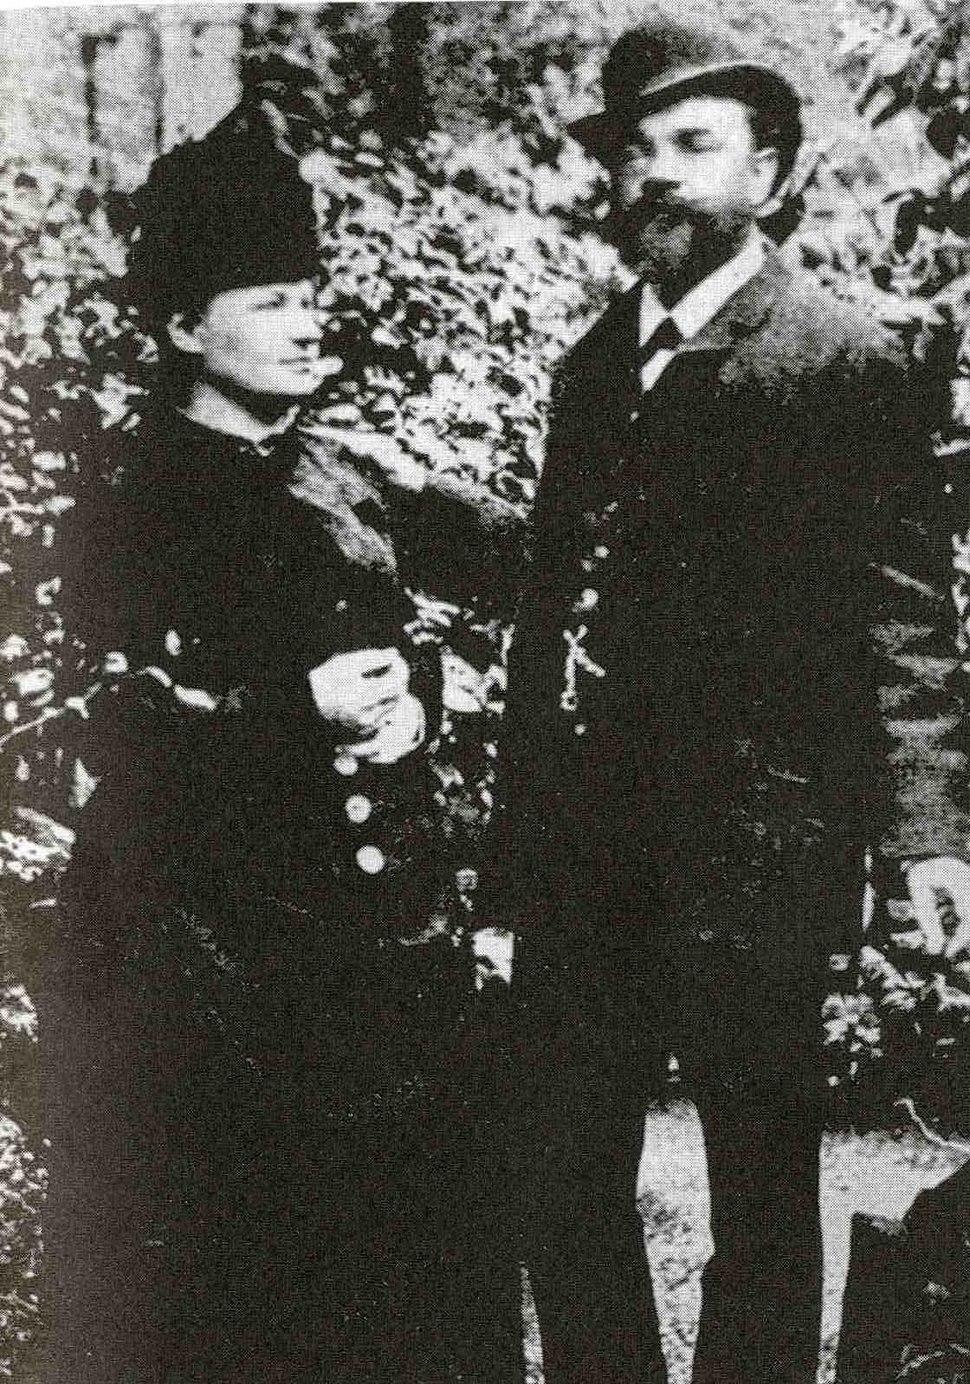 Anton%C3%ADn Dvo%C5%99%C3%A1k with his wife Anna in London, 1886